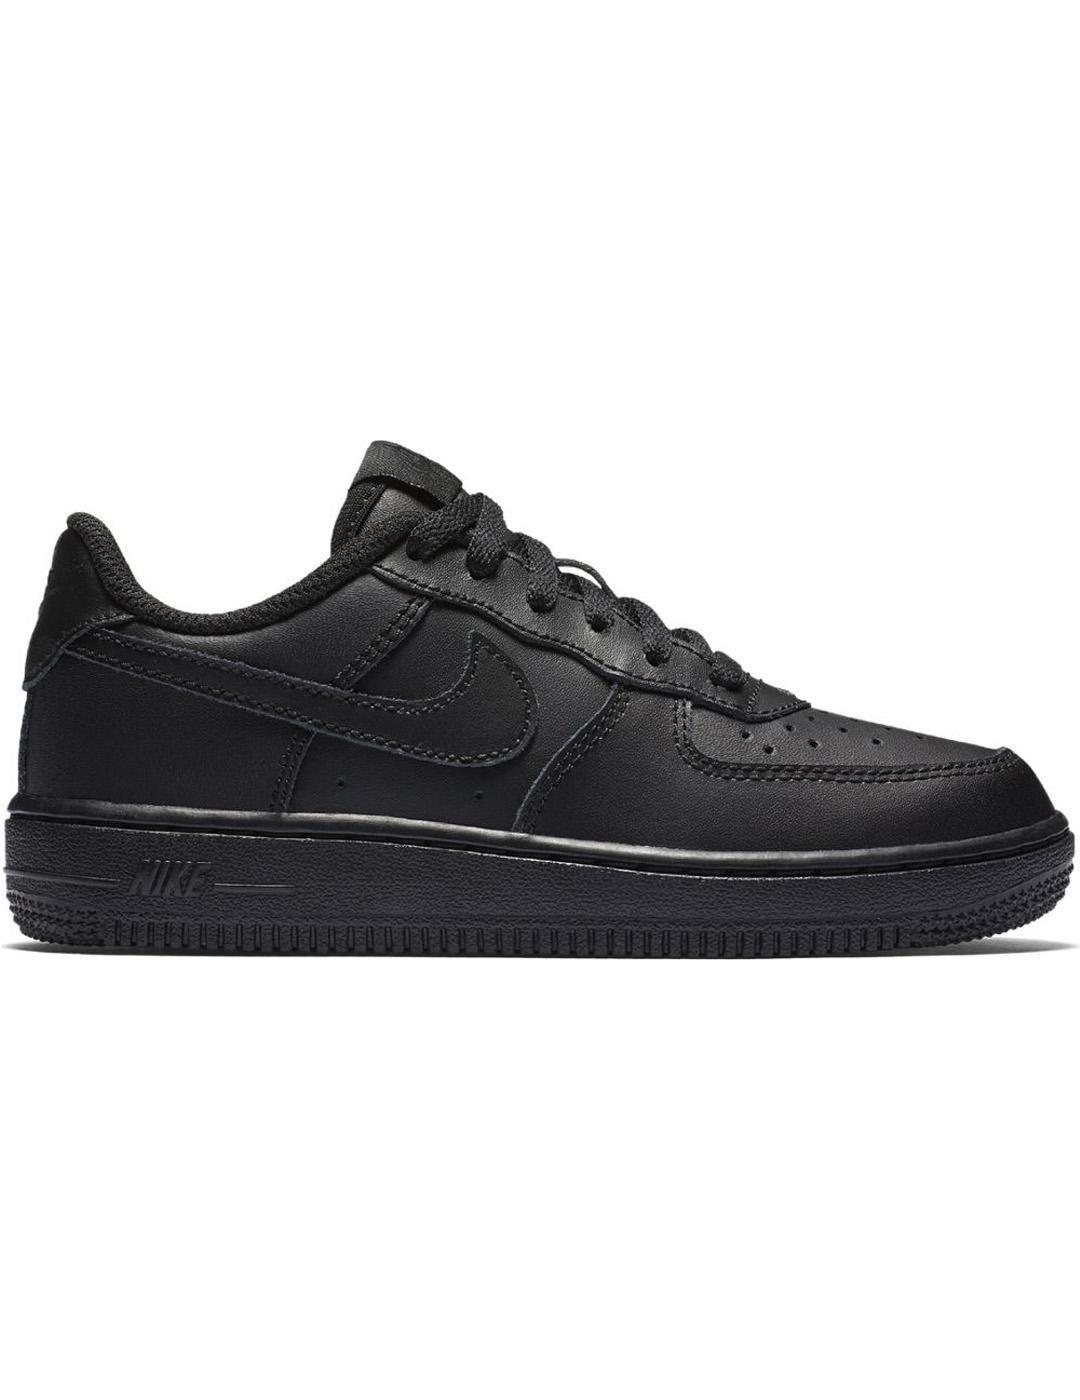 Nike Force 1 (Ps) Negro/negro Niño/a - 34